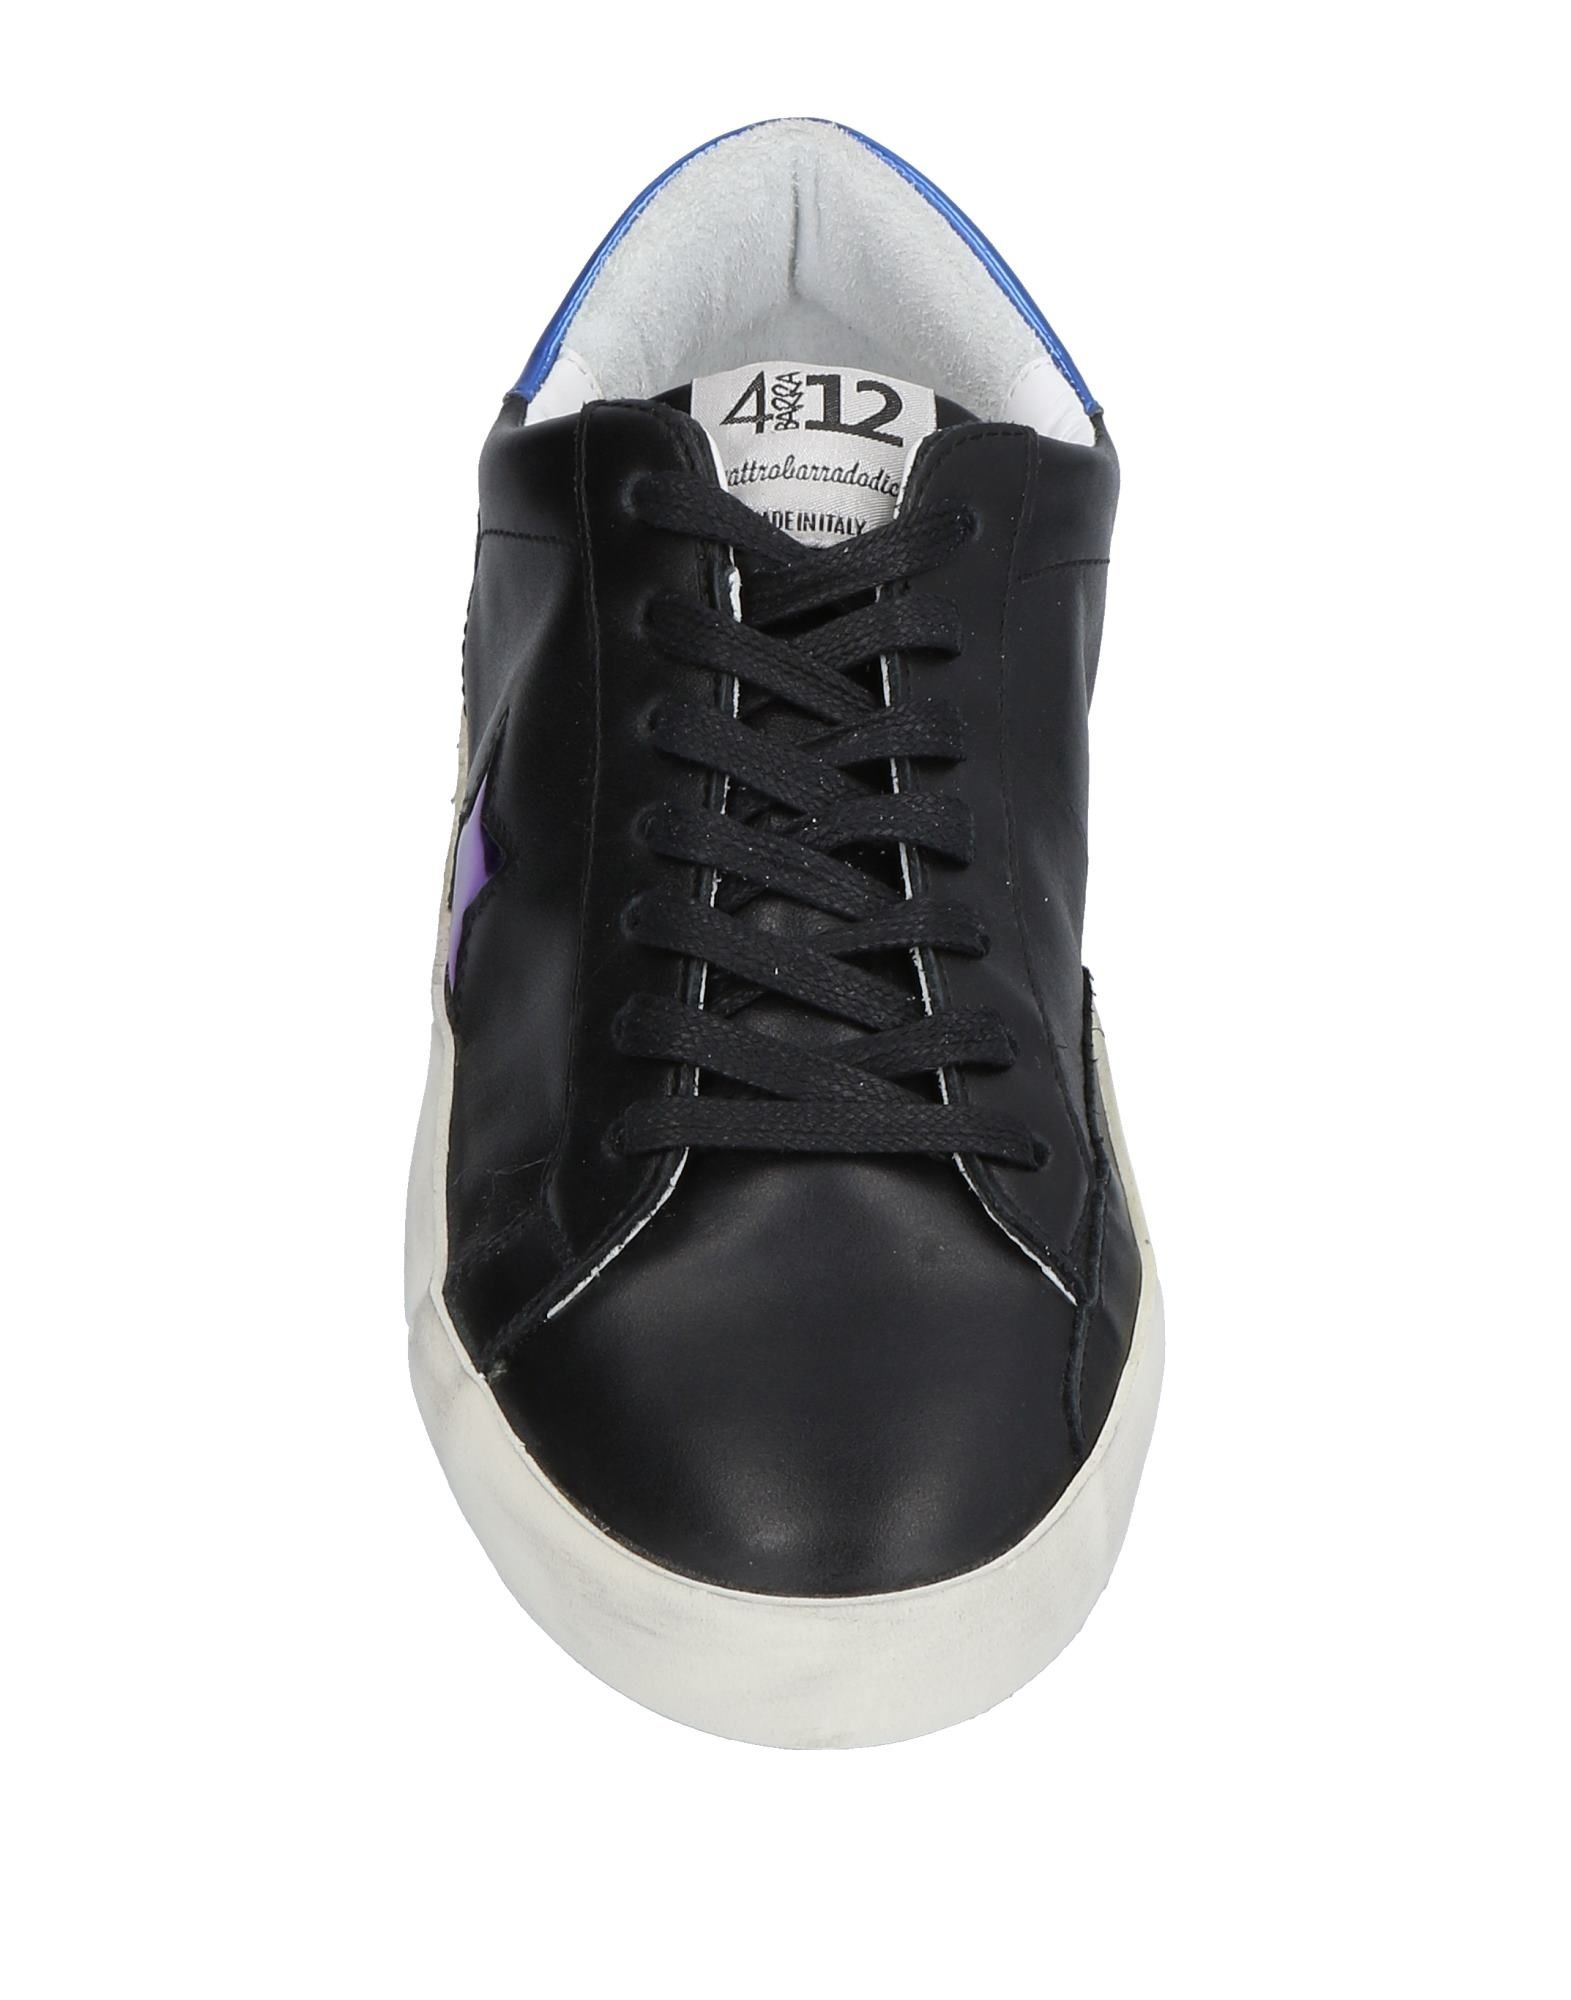 Quattrobarradodici Sneakers Damen Qualität  11474136LE Gute Qualität Damen beliebte Schuhe cf2bb9